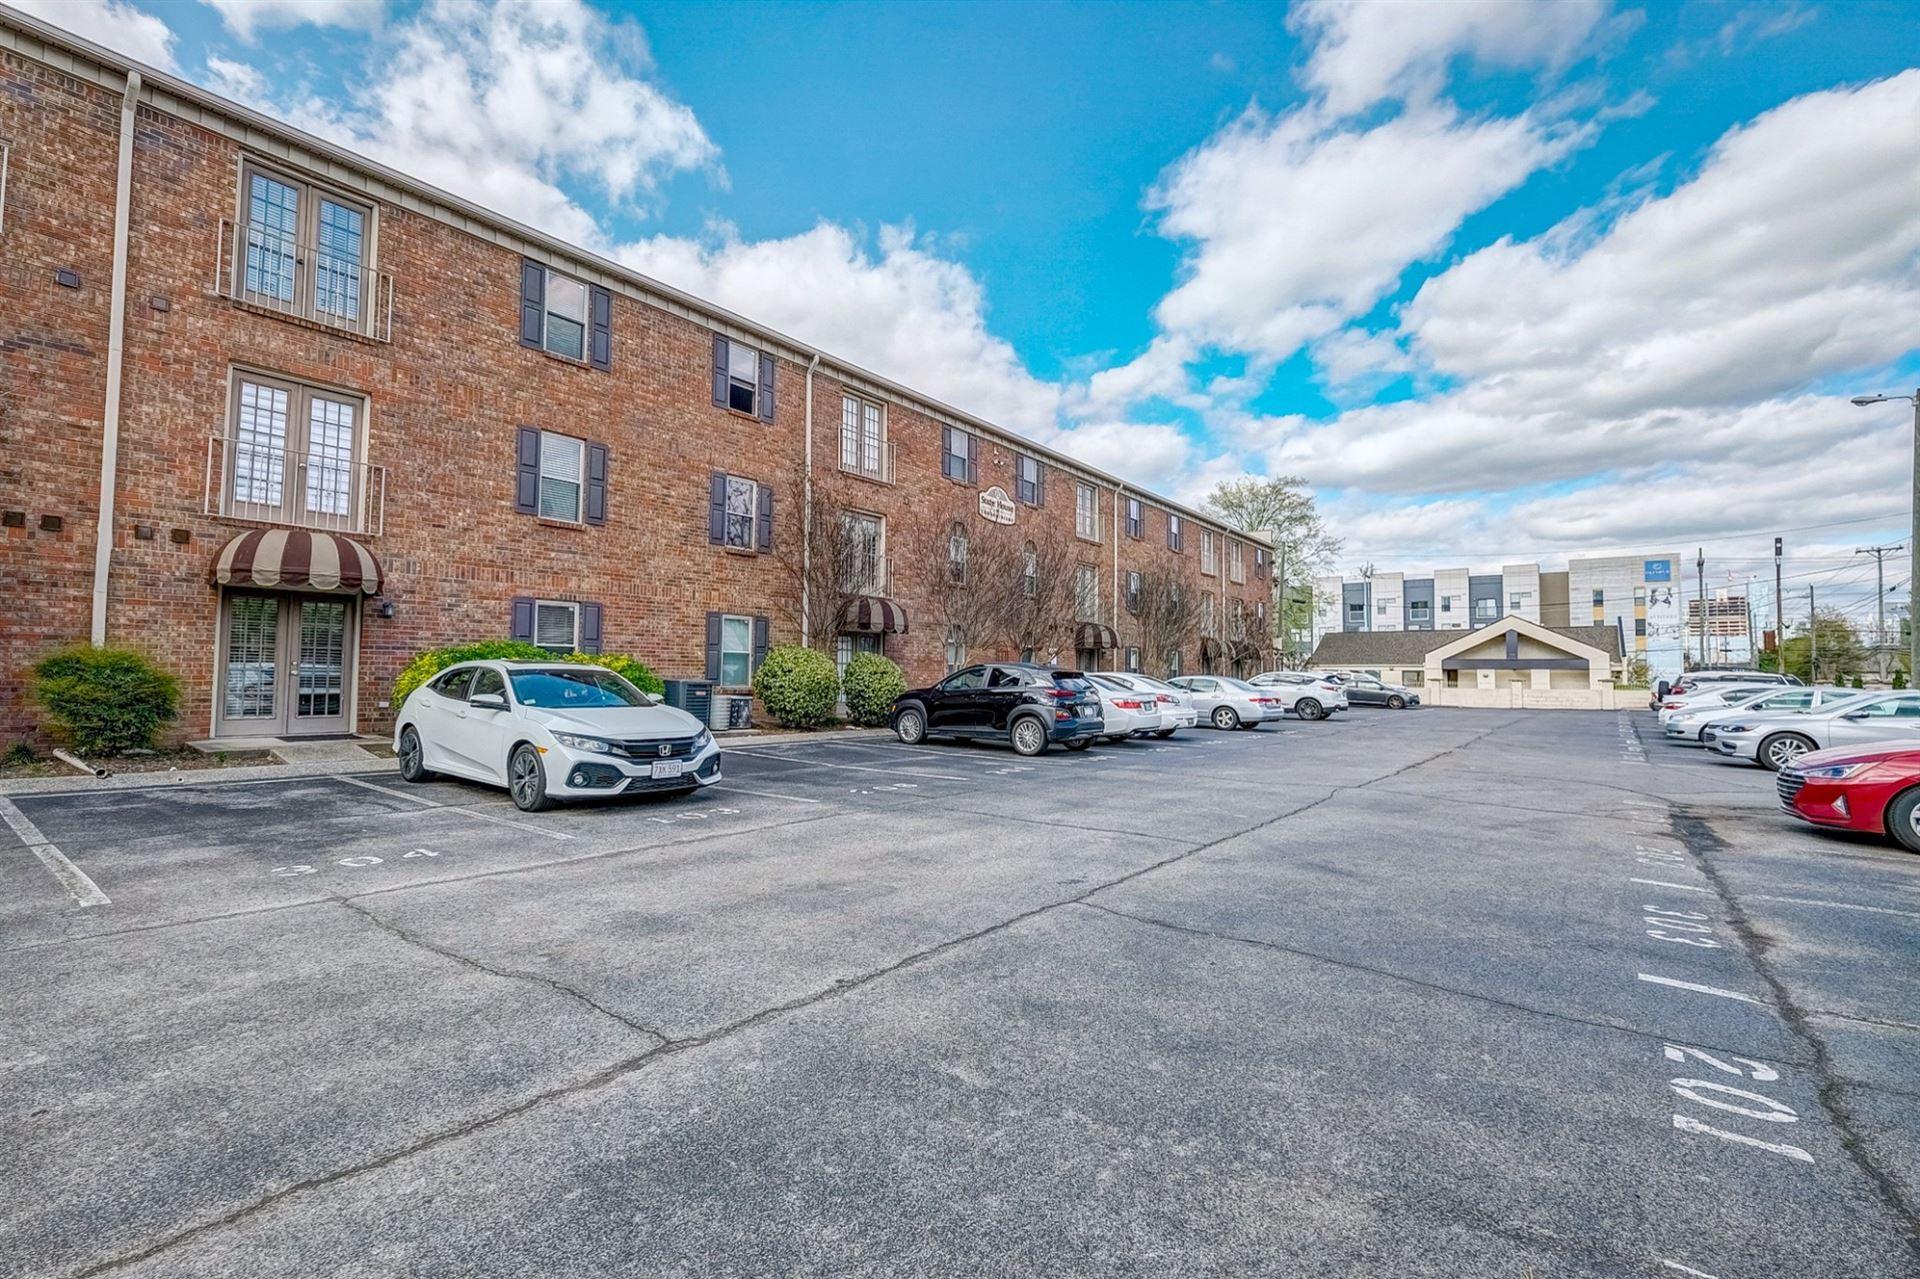 Photo of 1808 State St #203, Nashville, TN 37203 (MLS # 2163301)